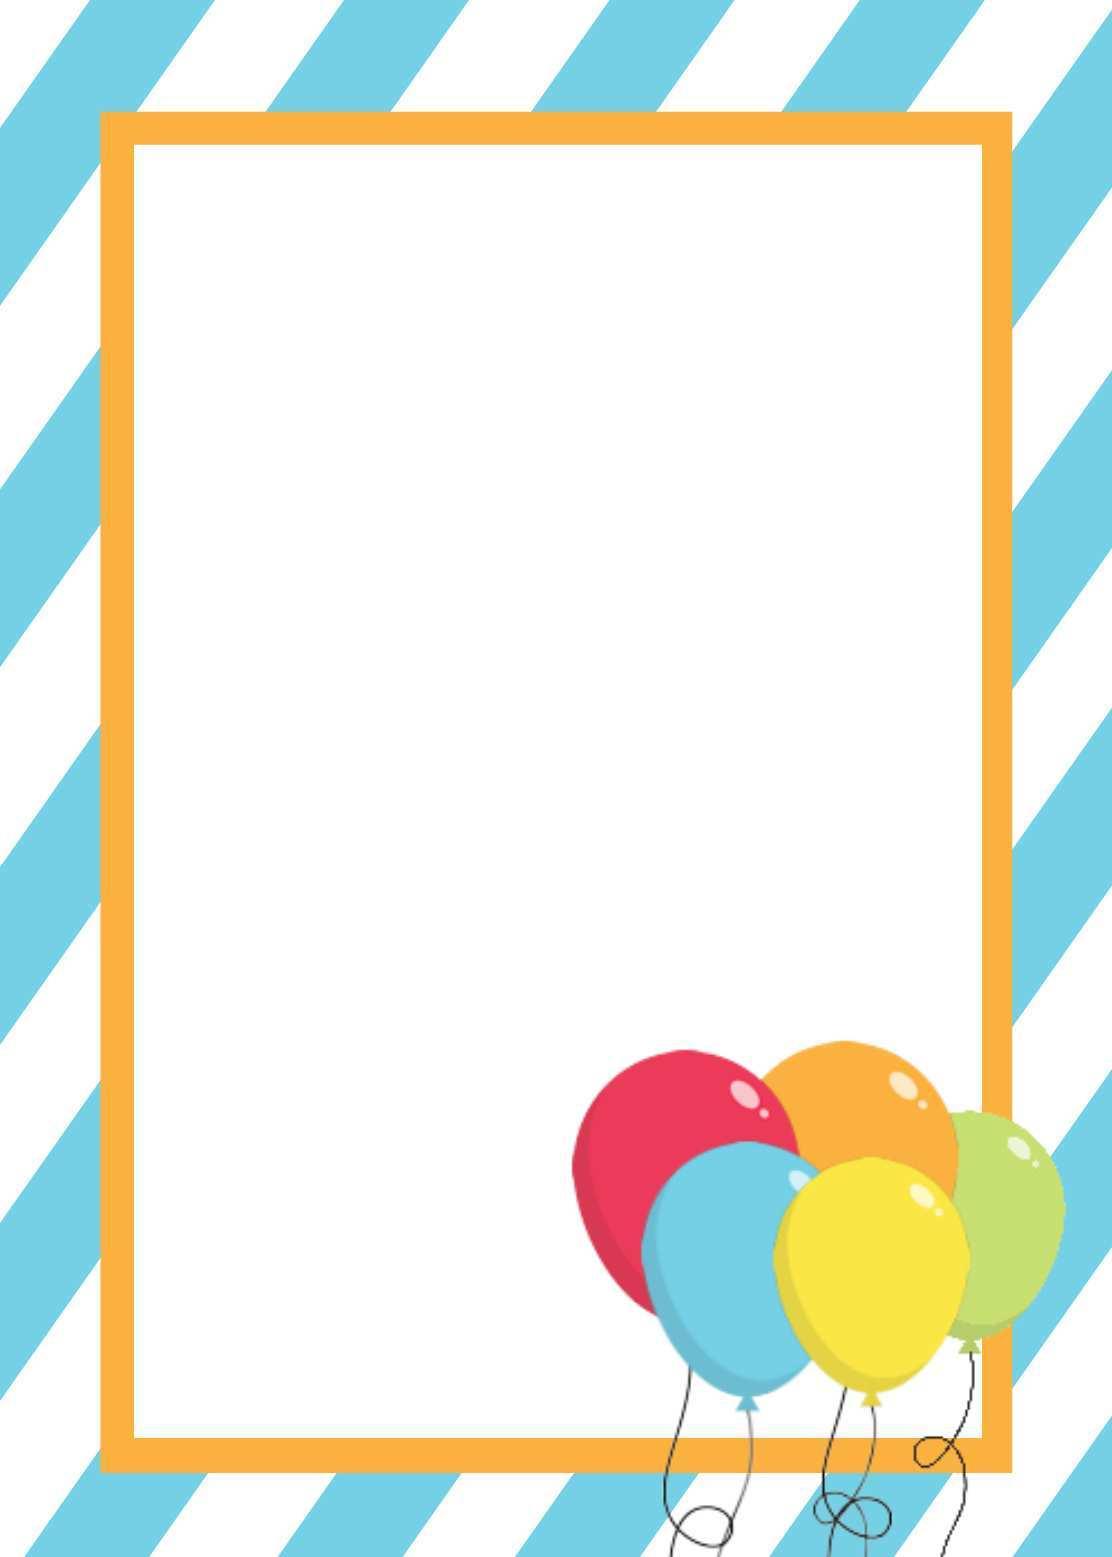 84 How To Create Kid Birthday Invitation Card Template Free Formating by  Kid Birthday Invitation Card Template Free - Cards Design Templates